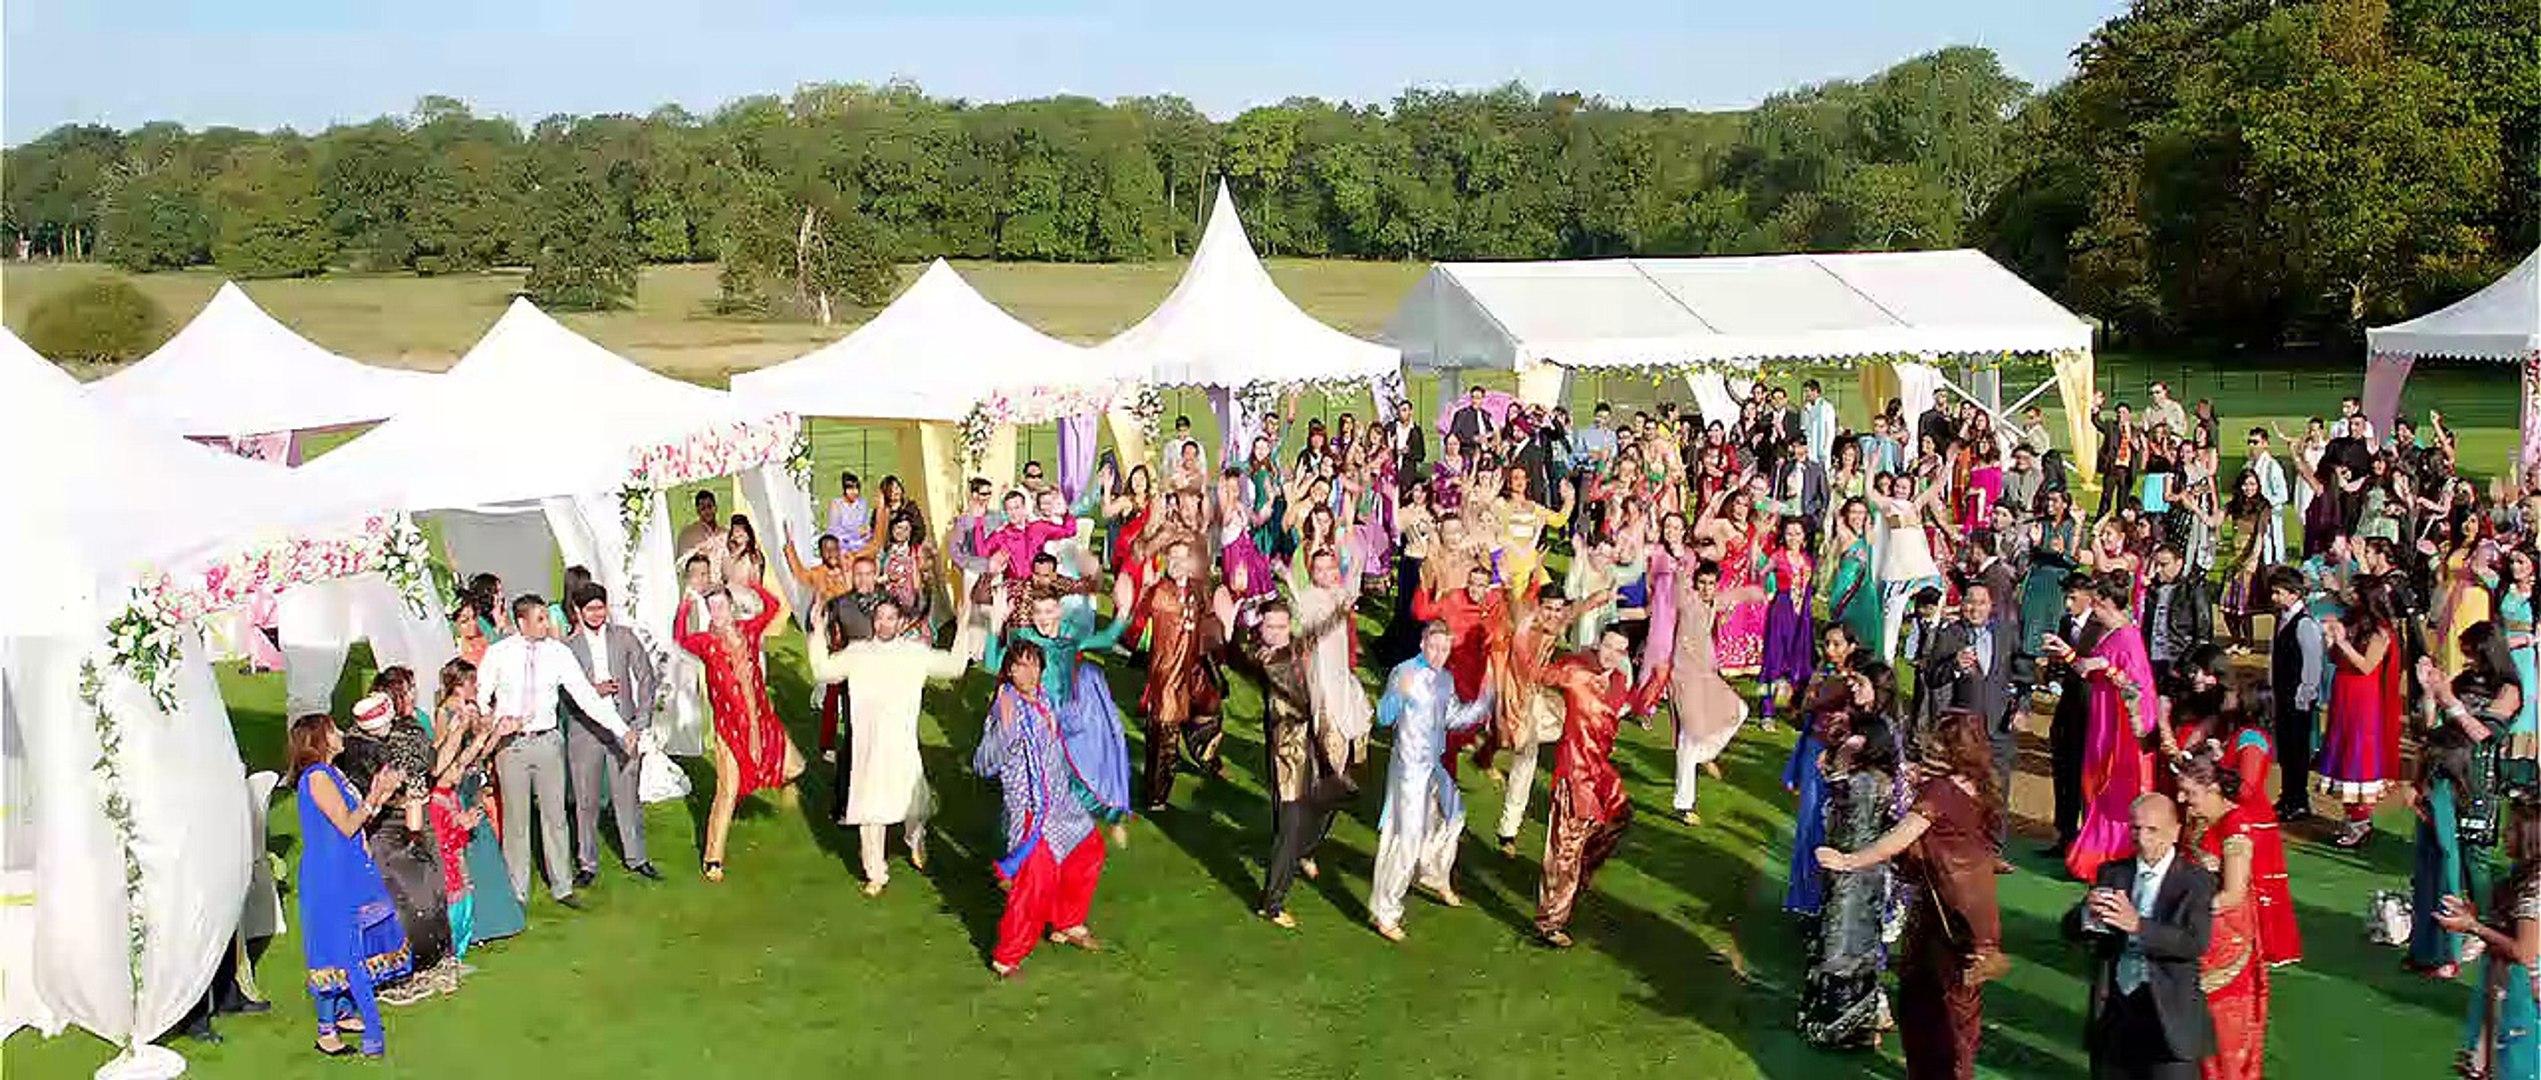 Suit Tera Laal Rang Da - Yamla Pagla Deewana 2 (2013) - Dharmendra, Sunny Deol, Bobby Deol, Neha Sha